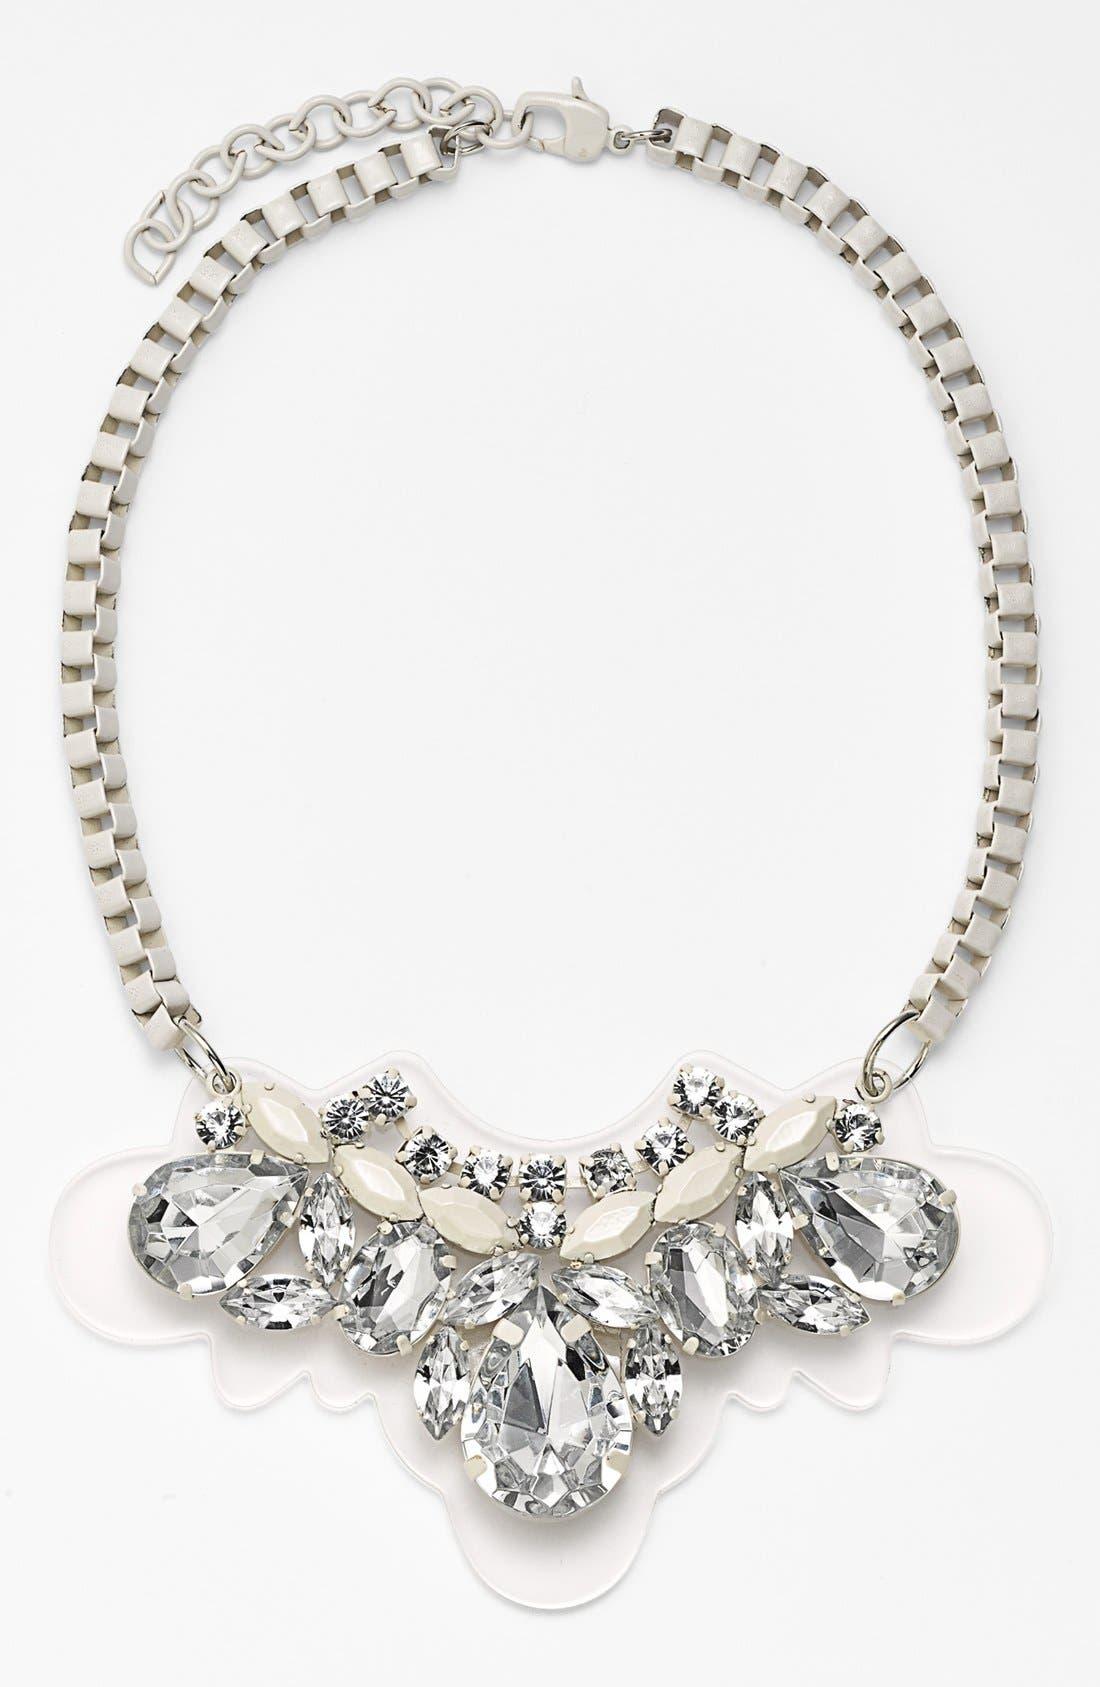 Main Image - Tasha Statement Bib Necklace